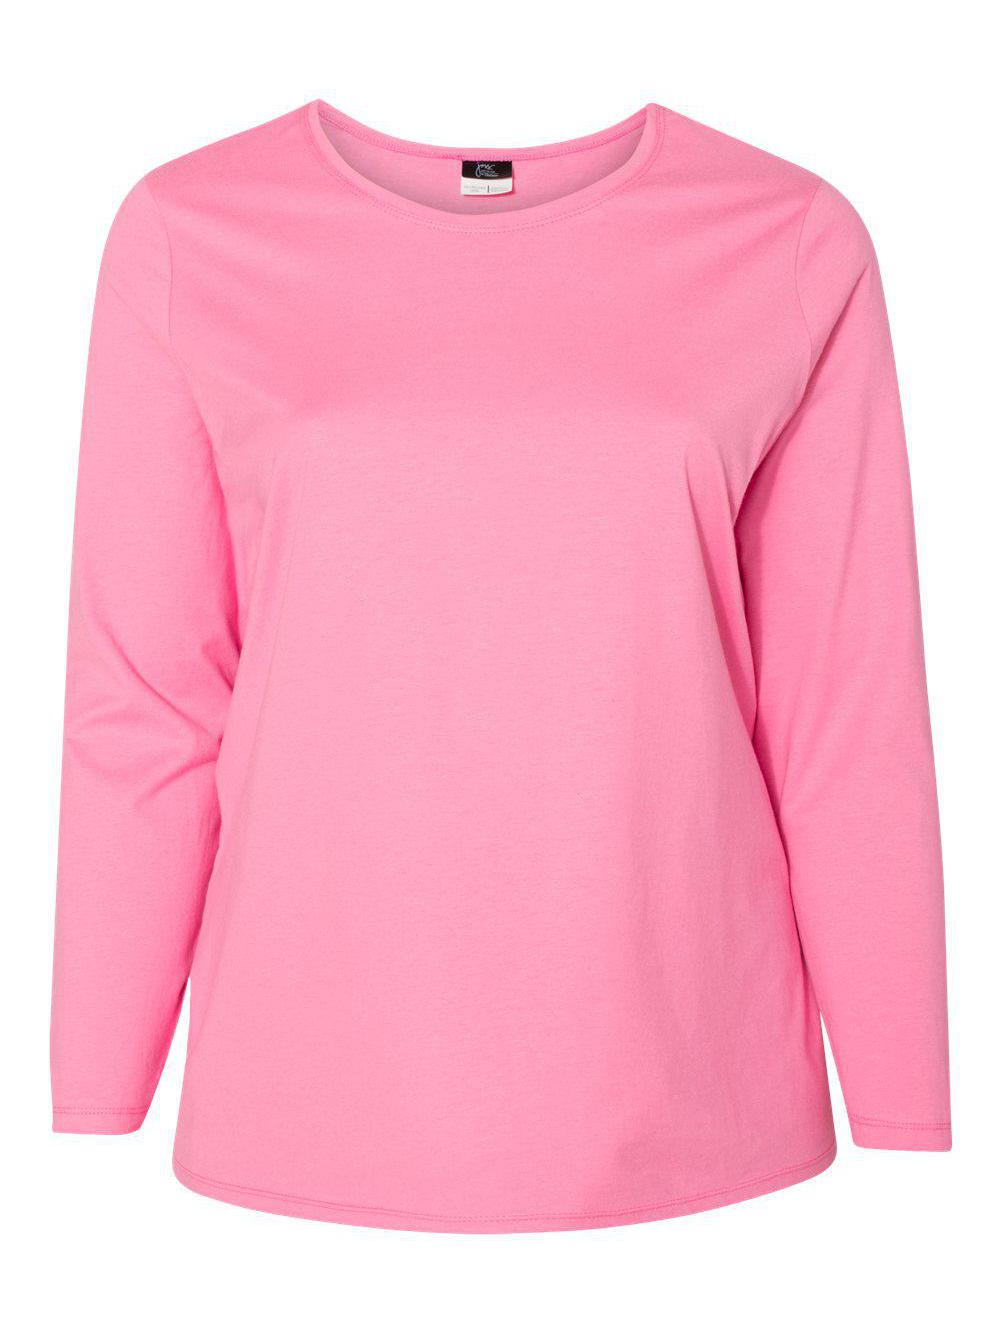 Just-My-Size-Women-039-s-Long-Sleeve-T-Shirt-JMS40 thumbnail 15